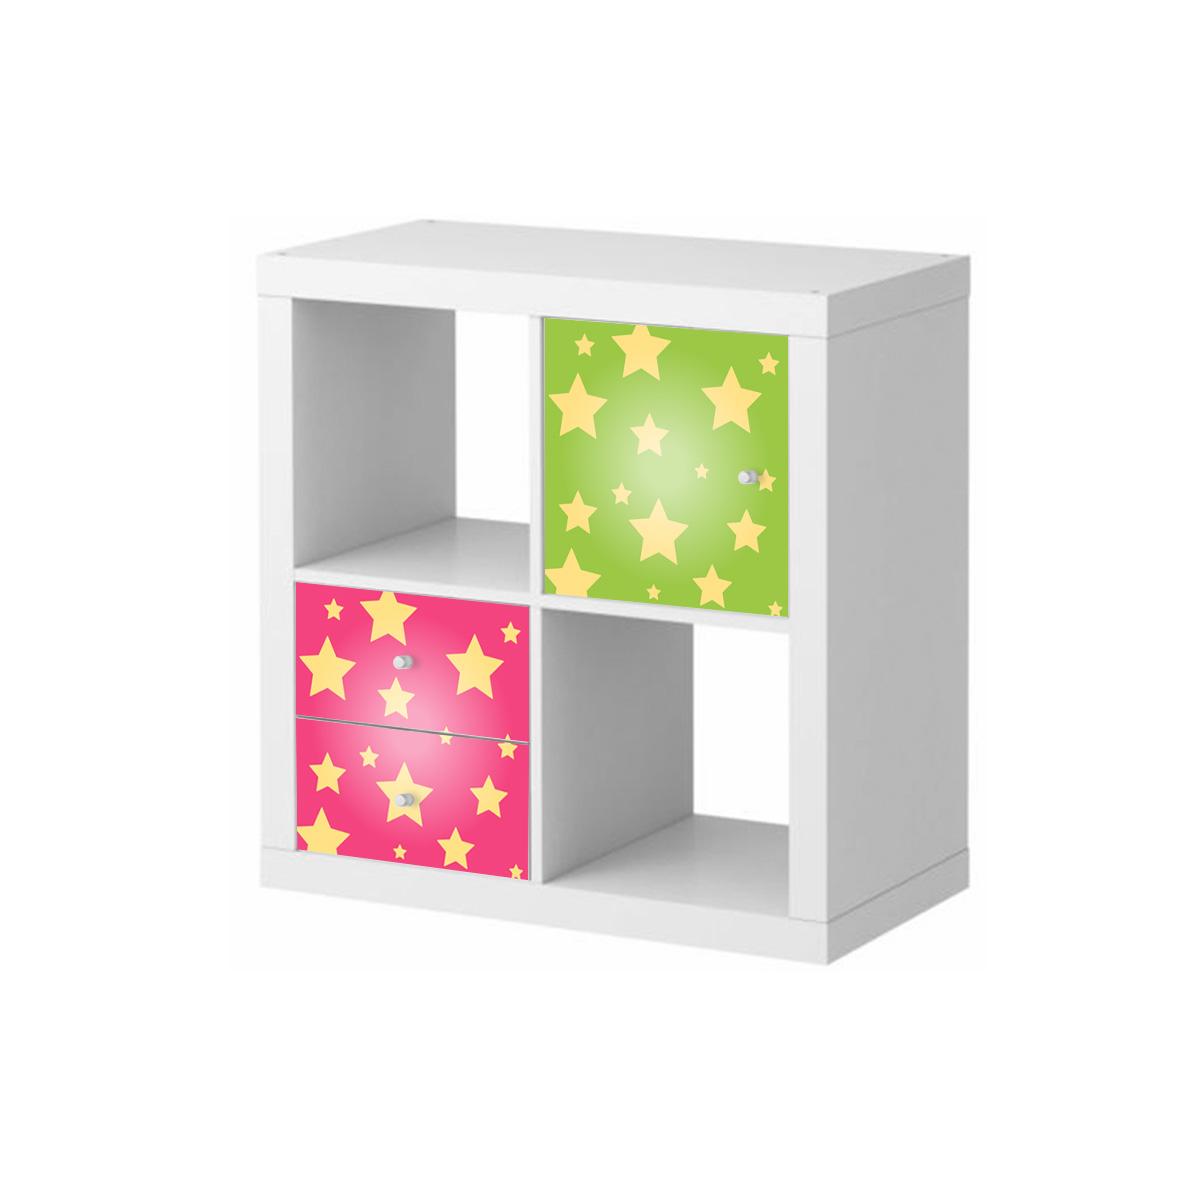 stickers meubles ikea stickers meubles ikea toiles sur le vert ambiance. Black Bedroom Furniture Sets. Home Design Ideas